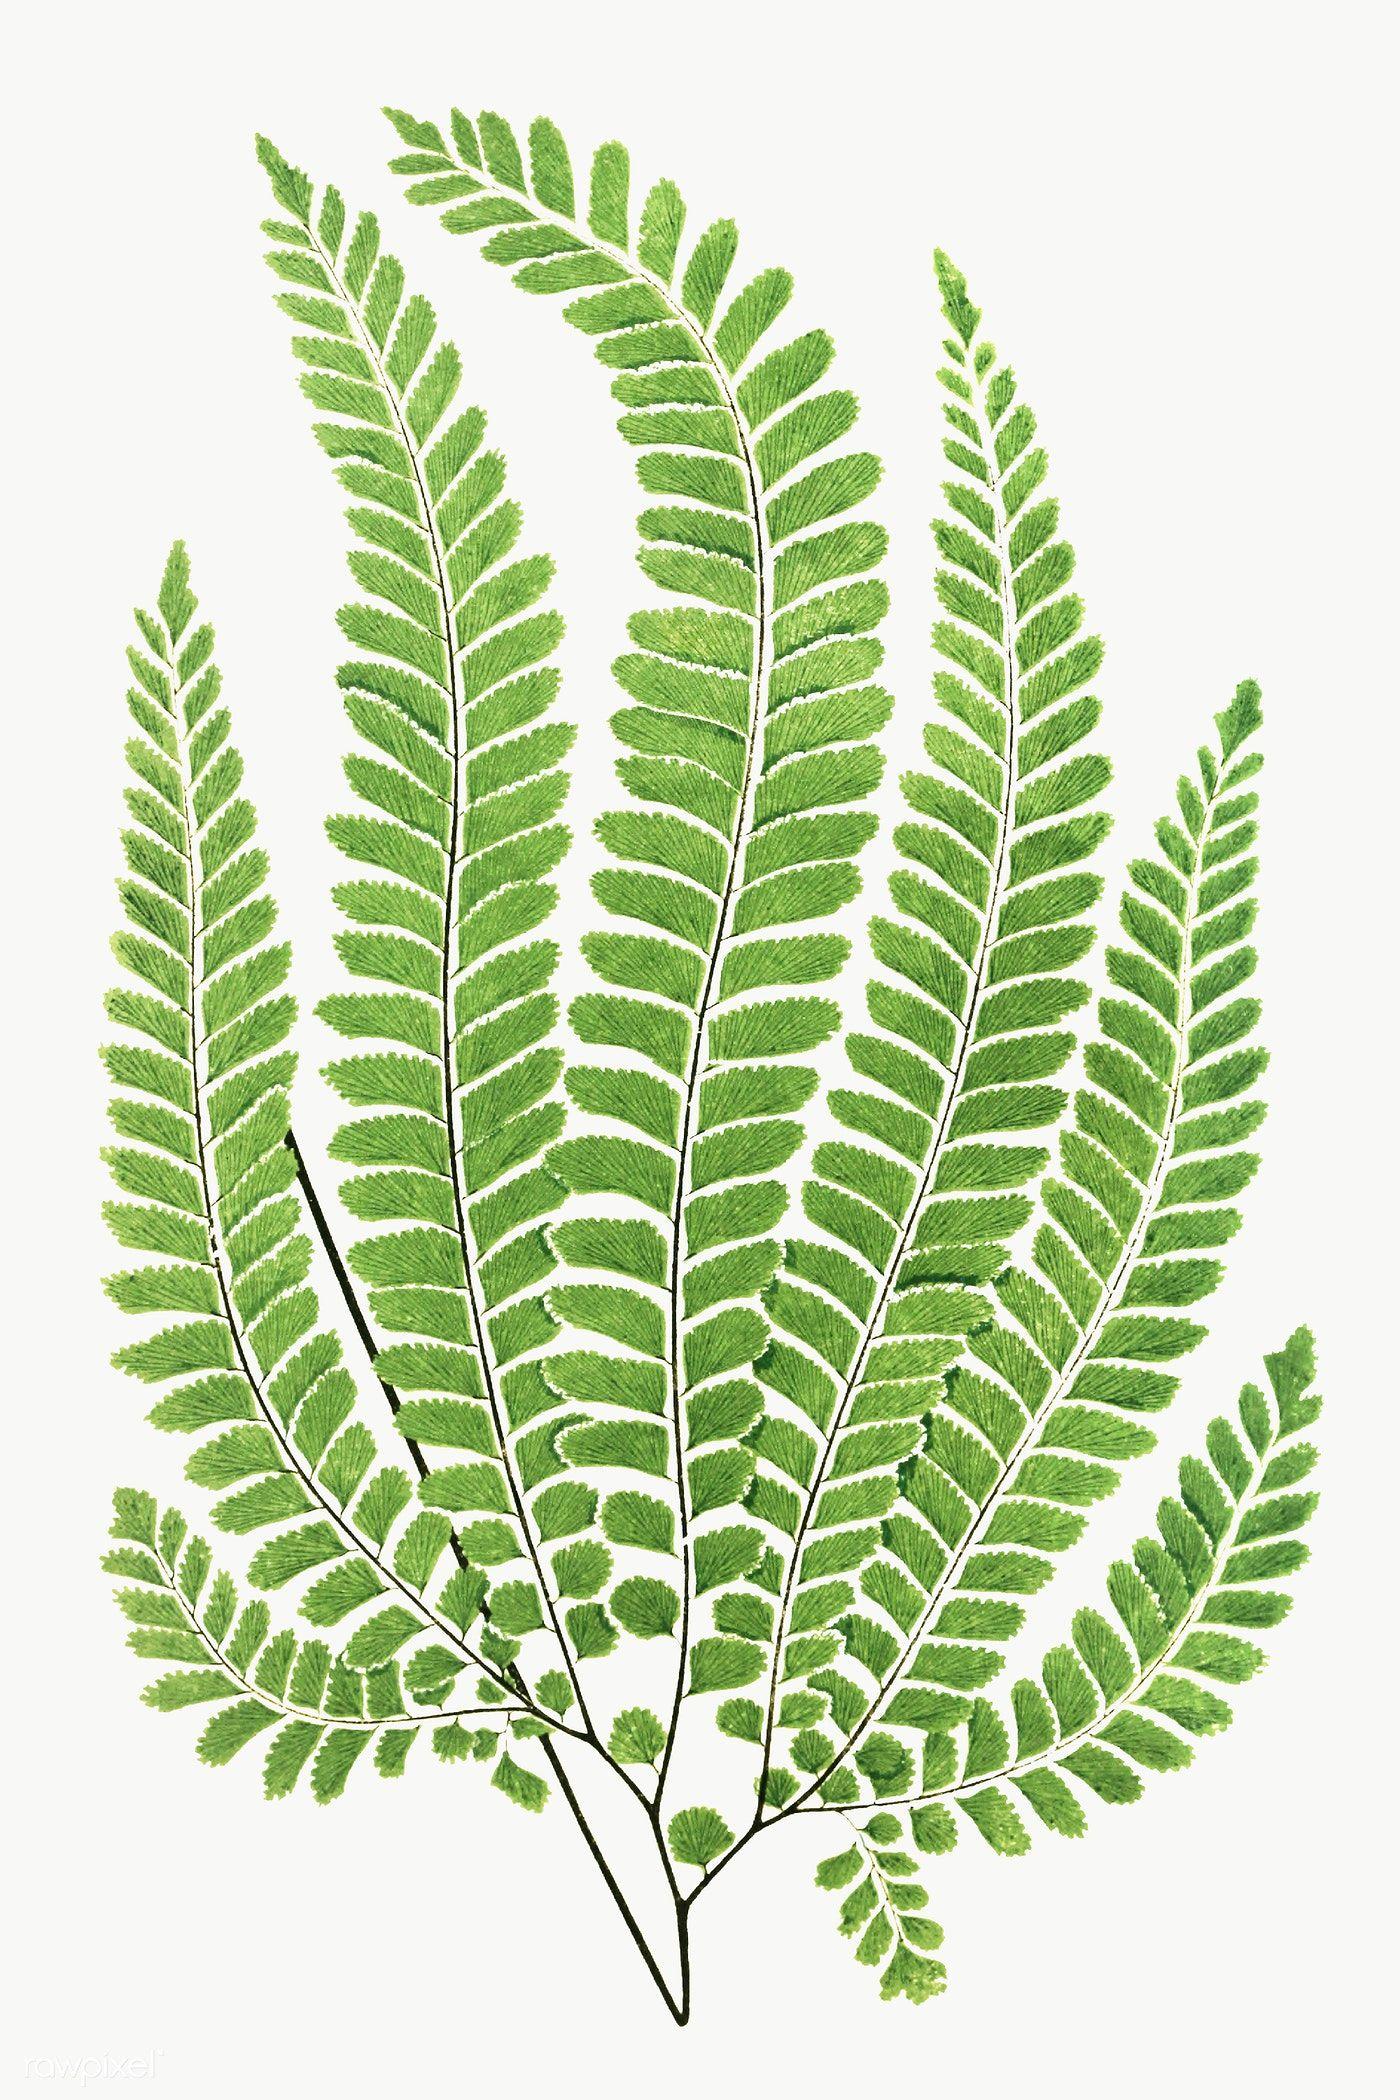 Adiantum Pubescens Fern Leaf Illustration Transparent Png Premium Image By Rawpixel Com Donlaya Leaf Illustration Tropical Leaves Illustration Plant Art